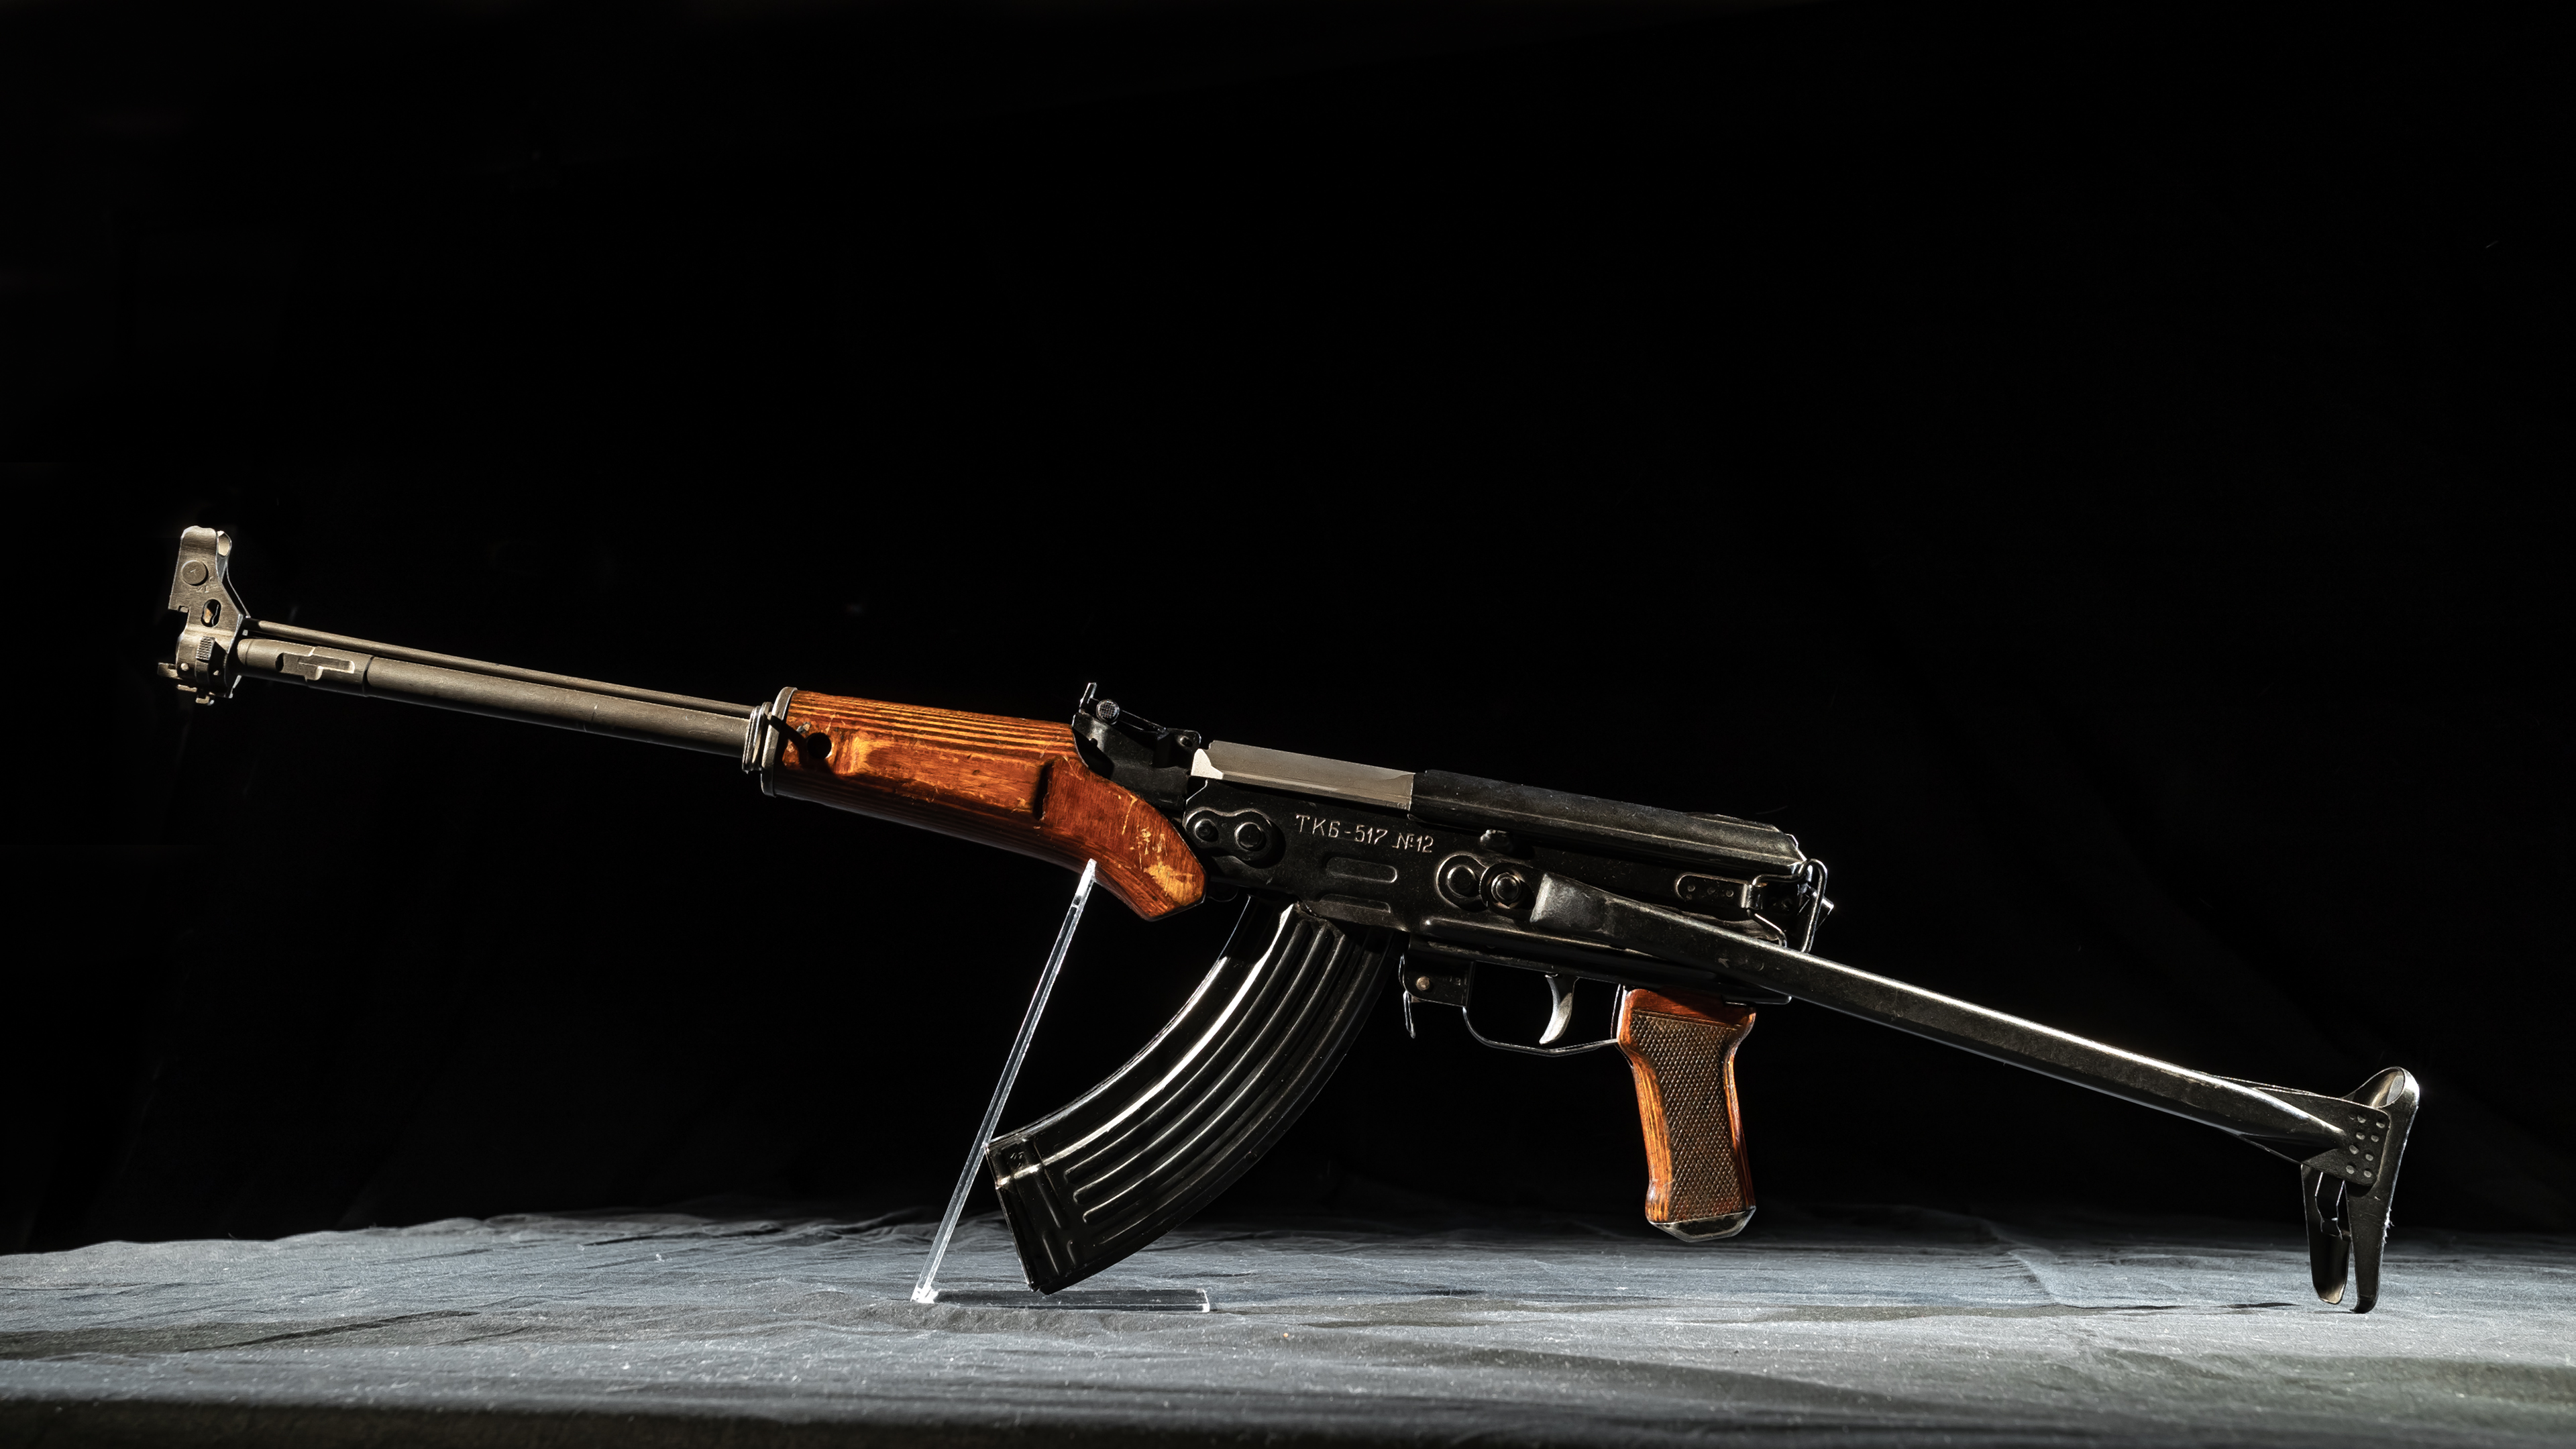 Experimental: TKB-517 by German Korobov